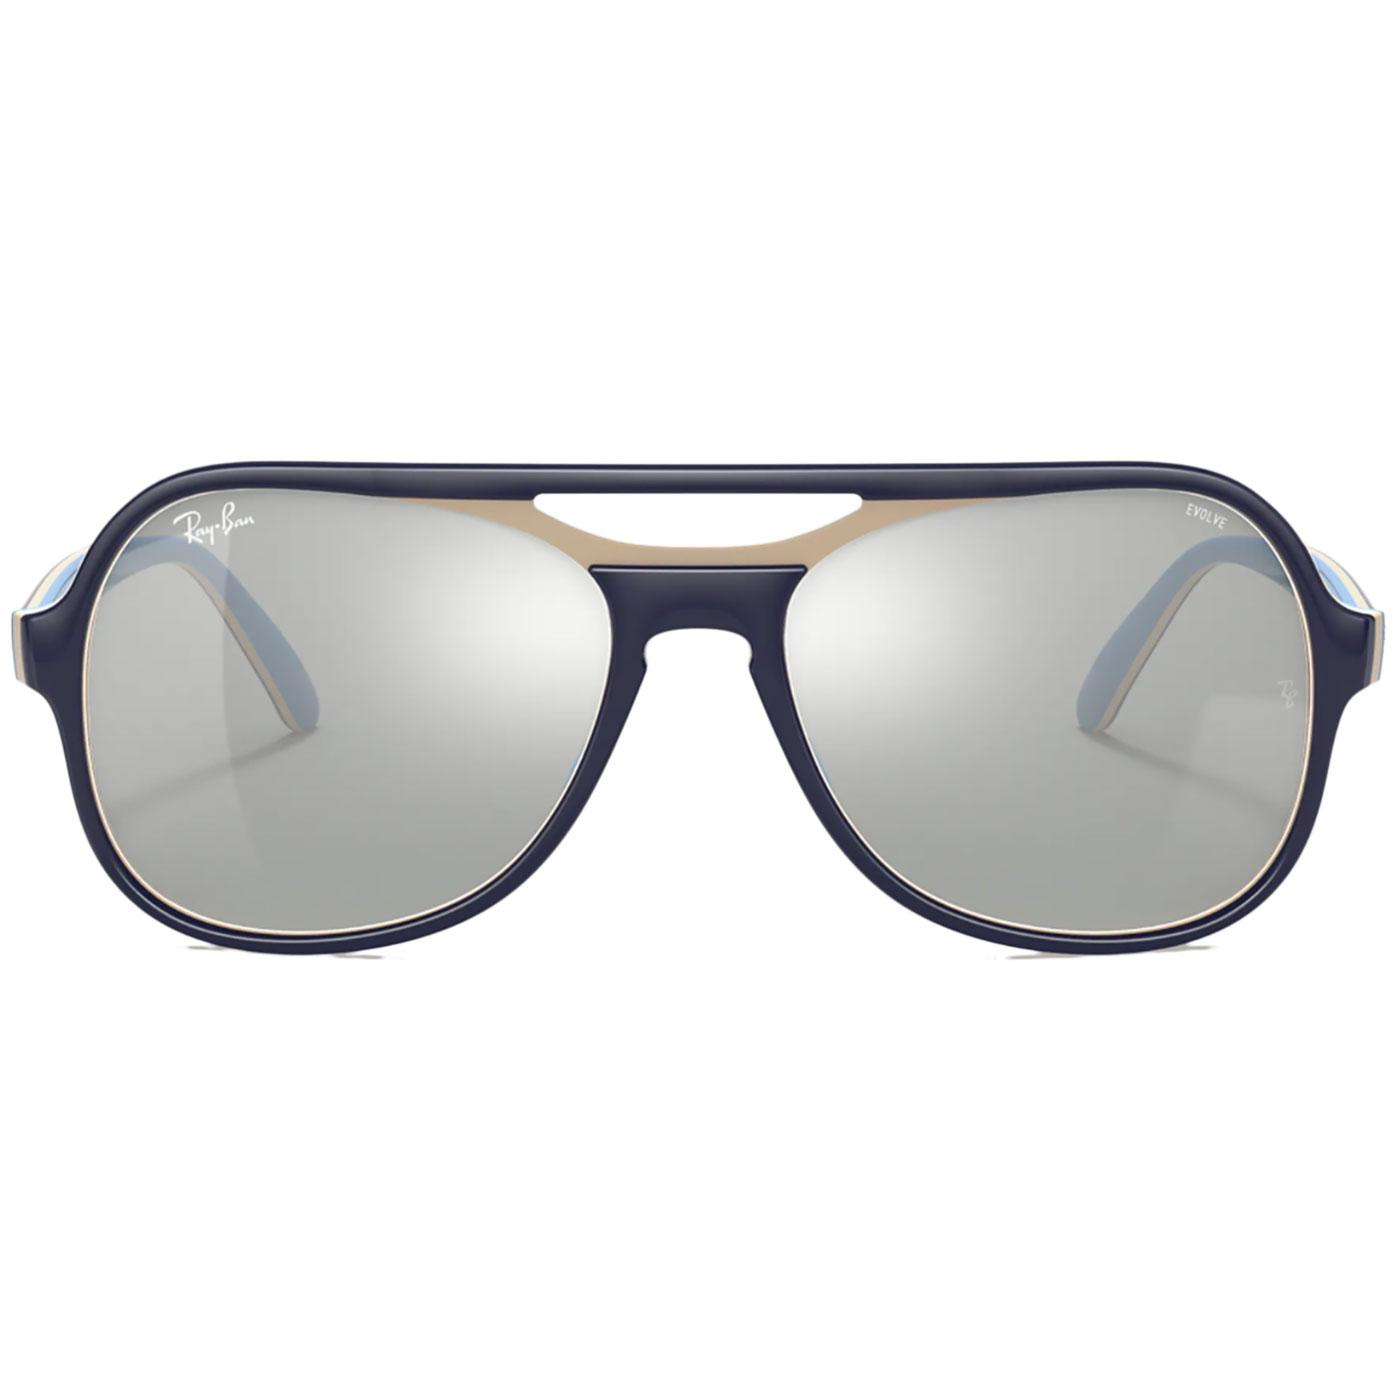 Powderhorn RAY-BAN 70s 2-Tone Aviator Sunglasses B